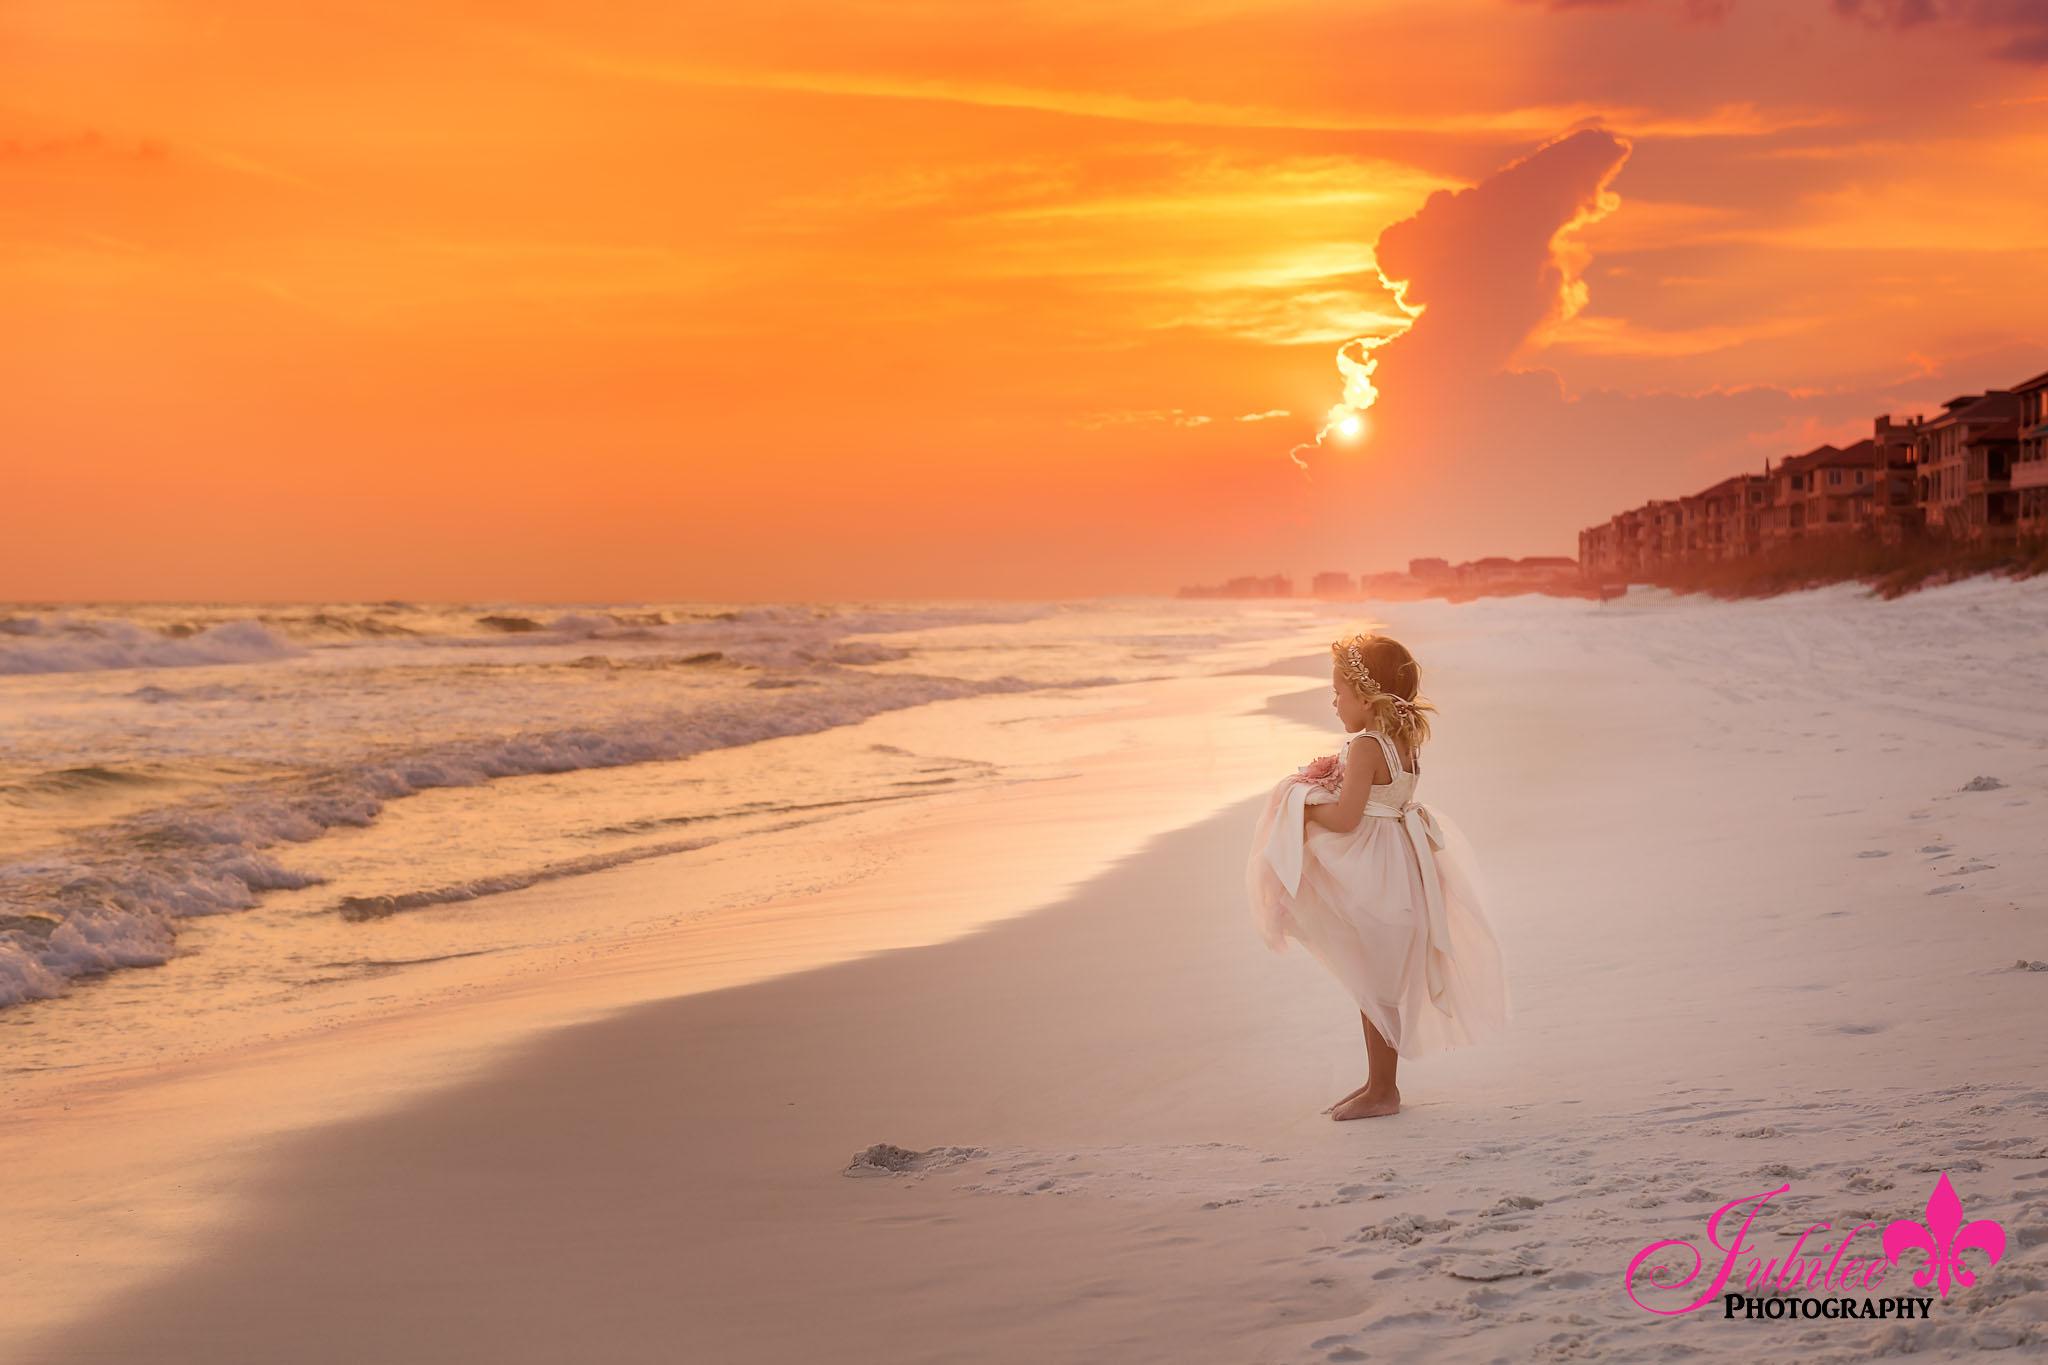 destin_beach_photographer_6206